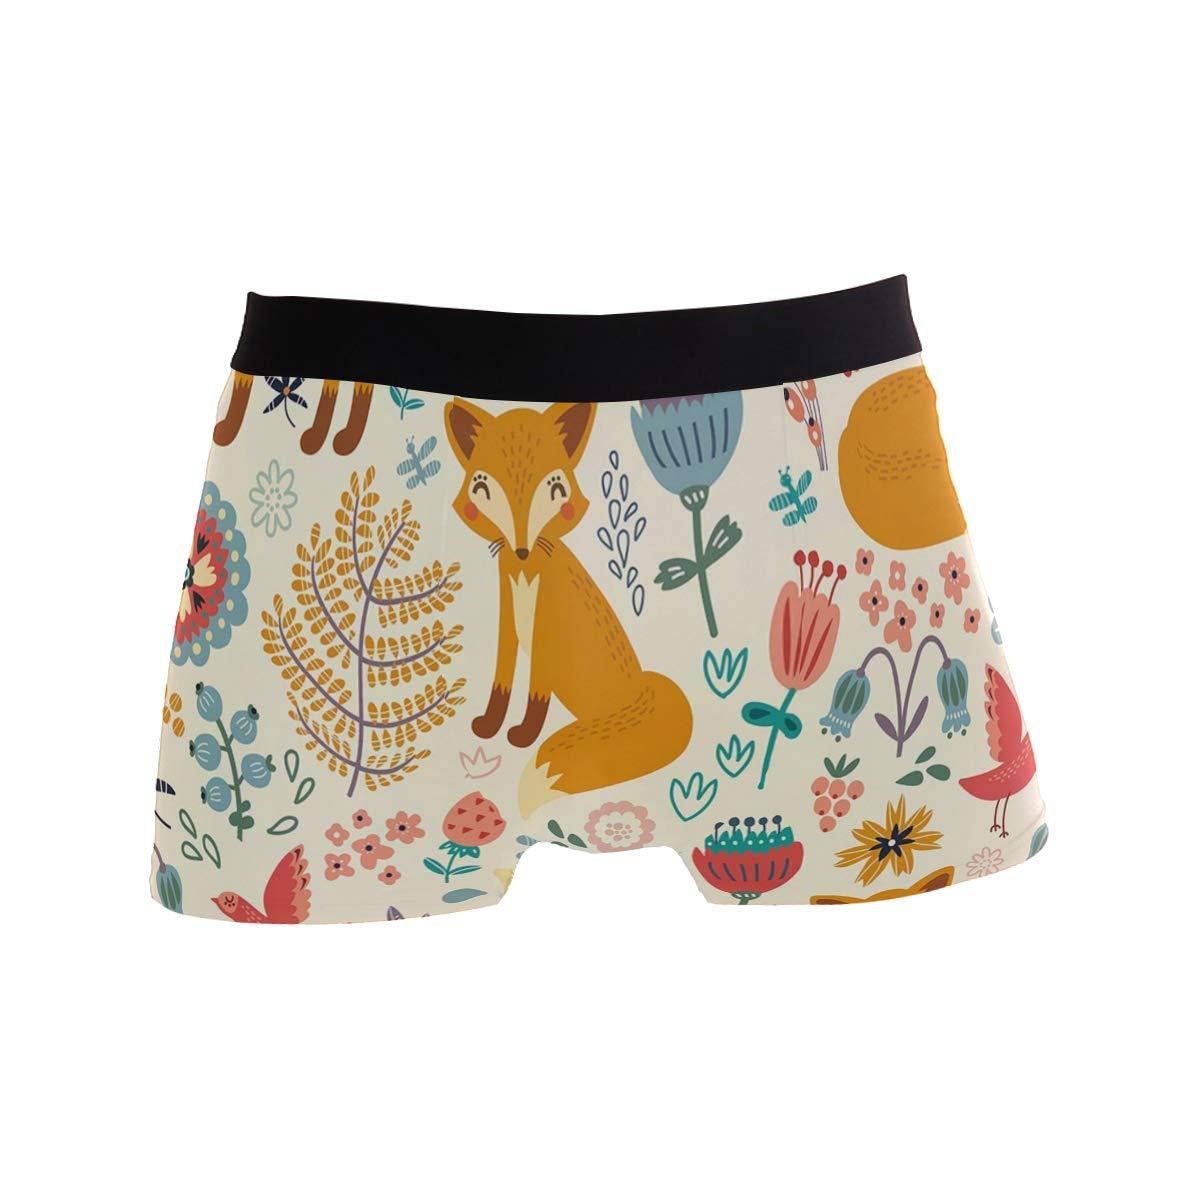 CATSDER Cute Foxes Ornate Flowers Boxer Briefs Mens Underwear Pack Seamless Comfort Soft